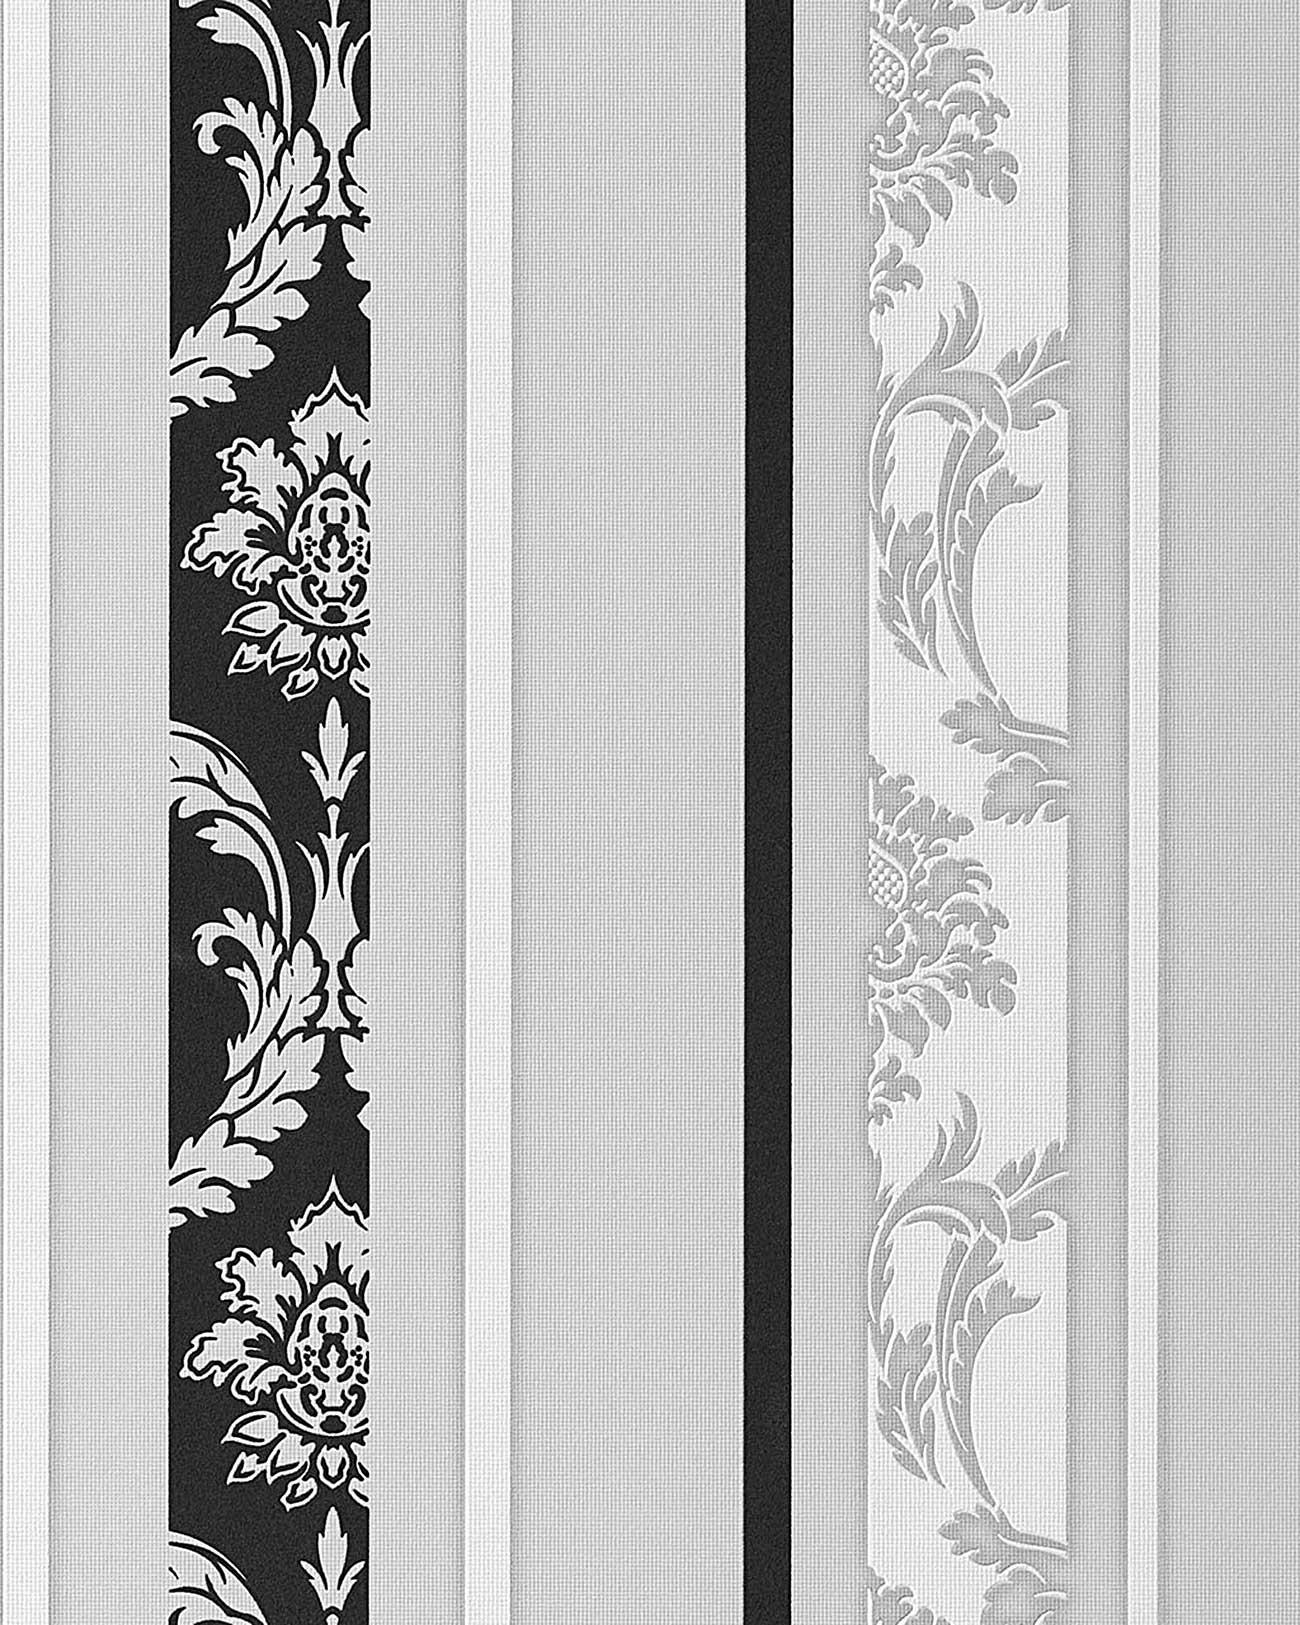 behang barok damast edem 053 20 strepen behang vinyl klassiek wit